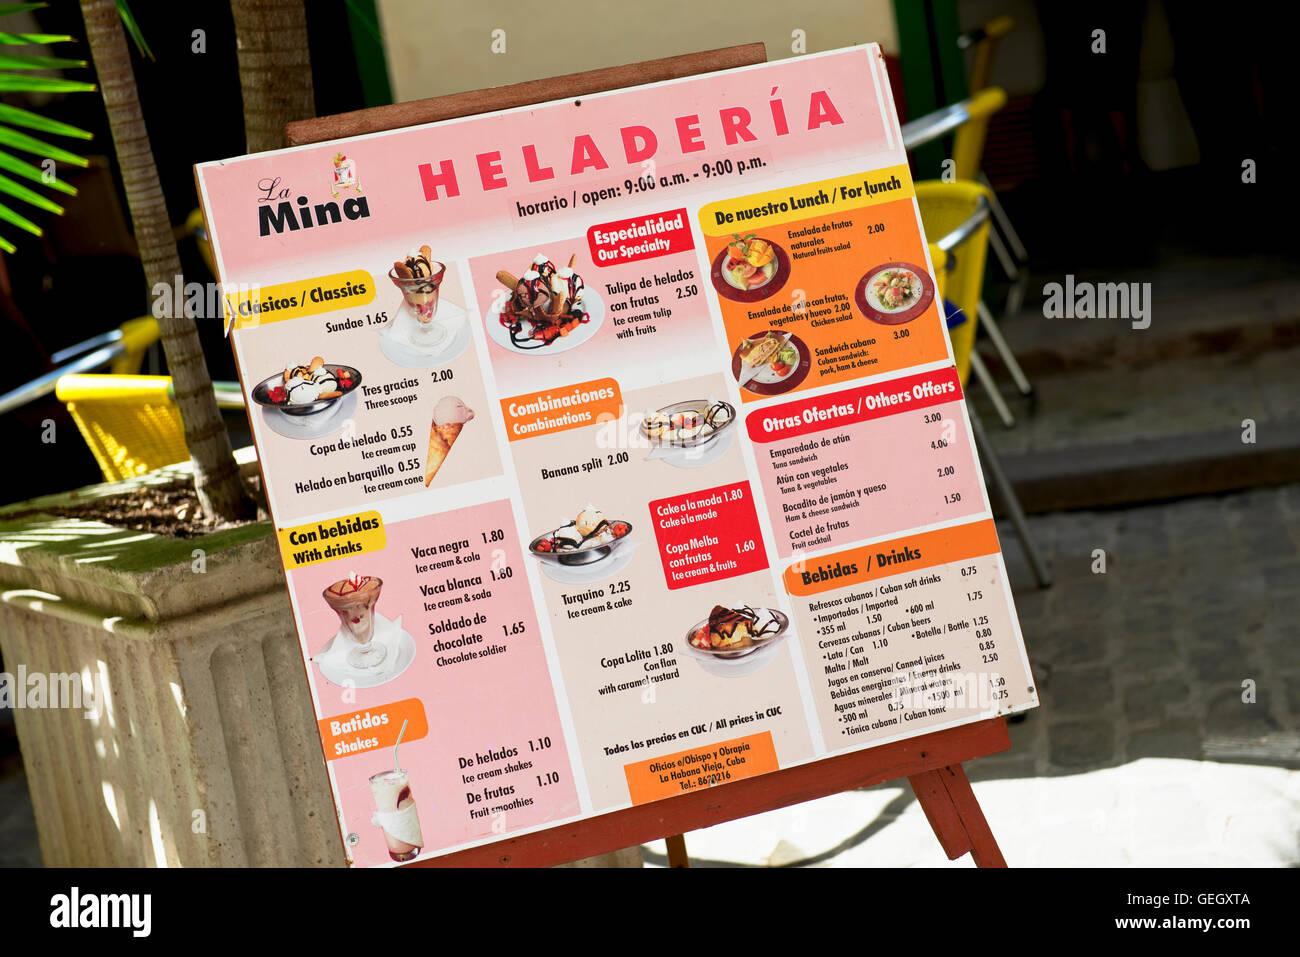 Menu Cuba Old Havana, La Habana Restaurant Food Prices CUC - Stock Image